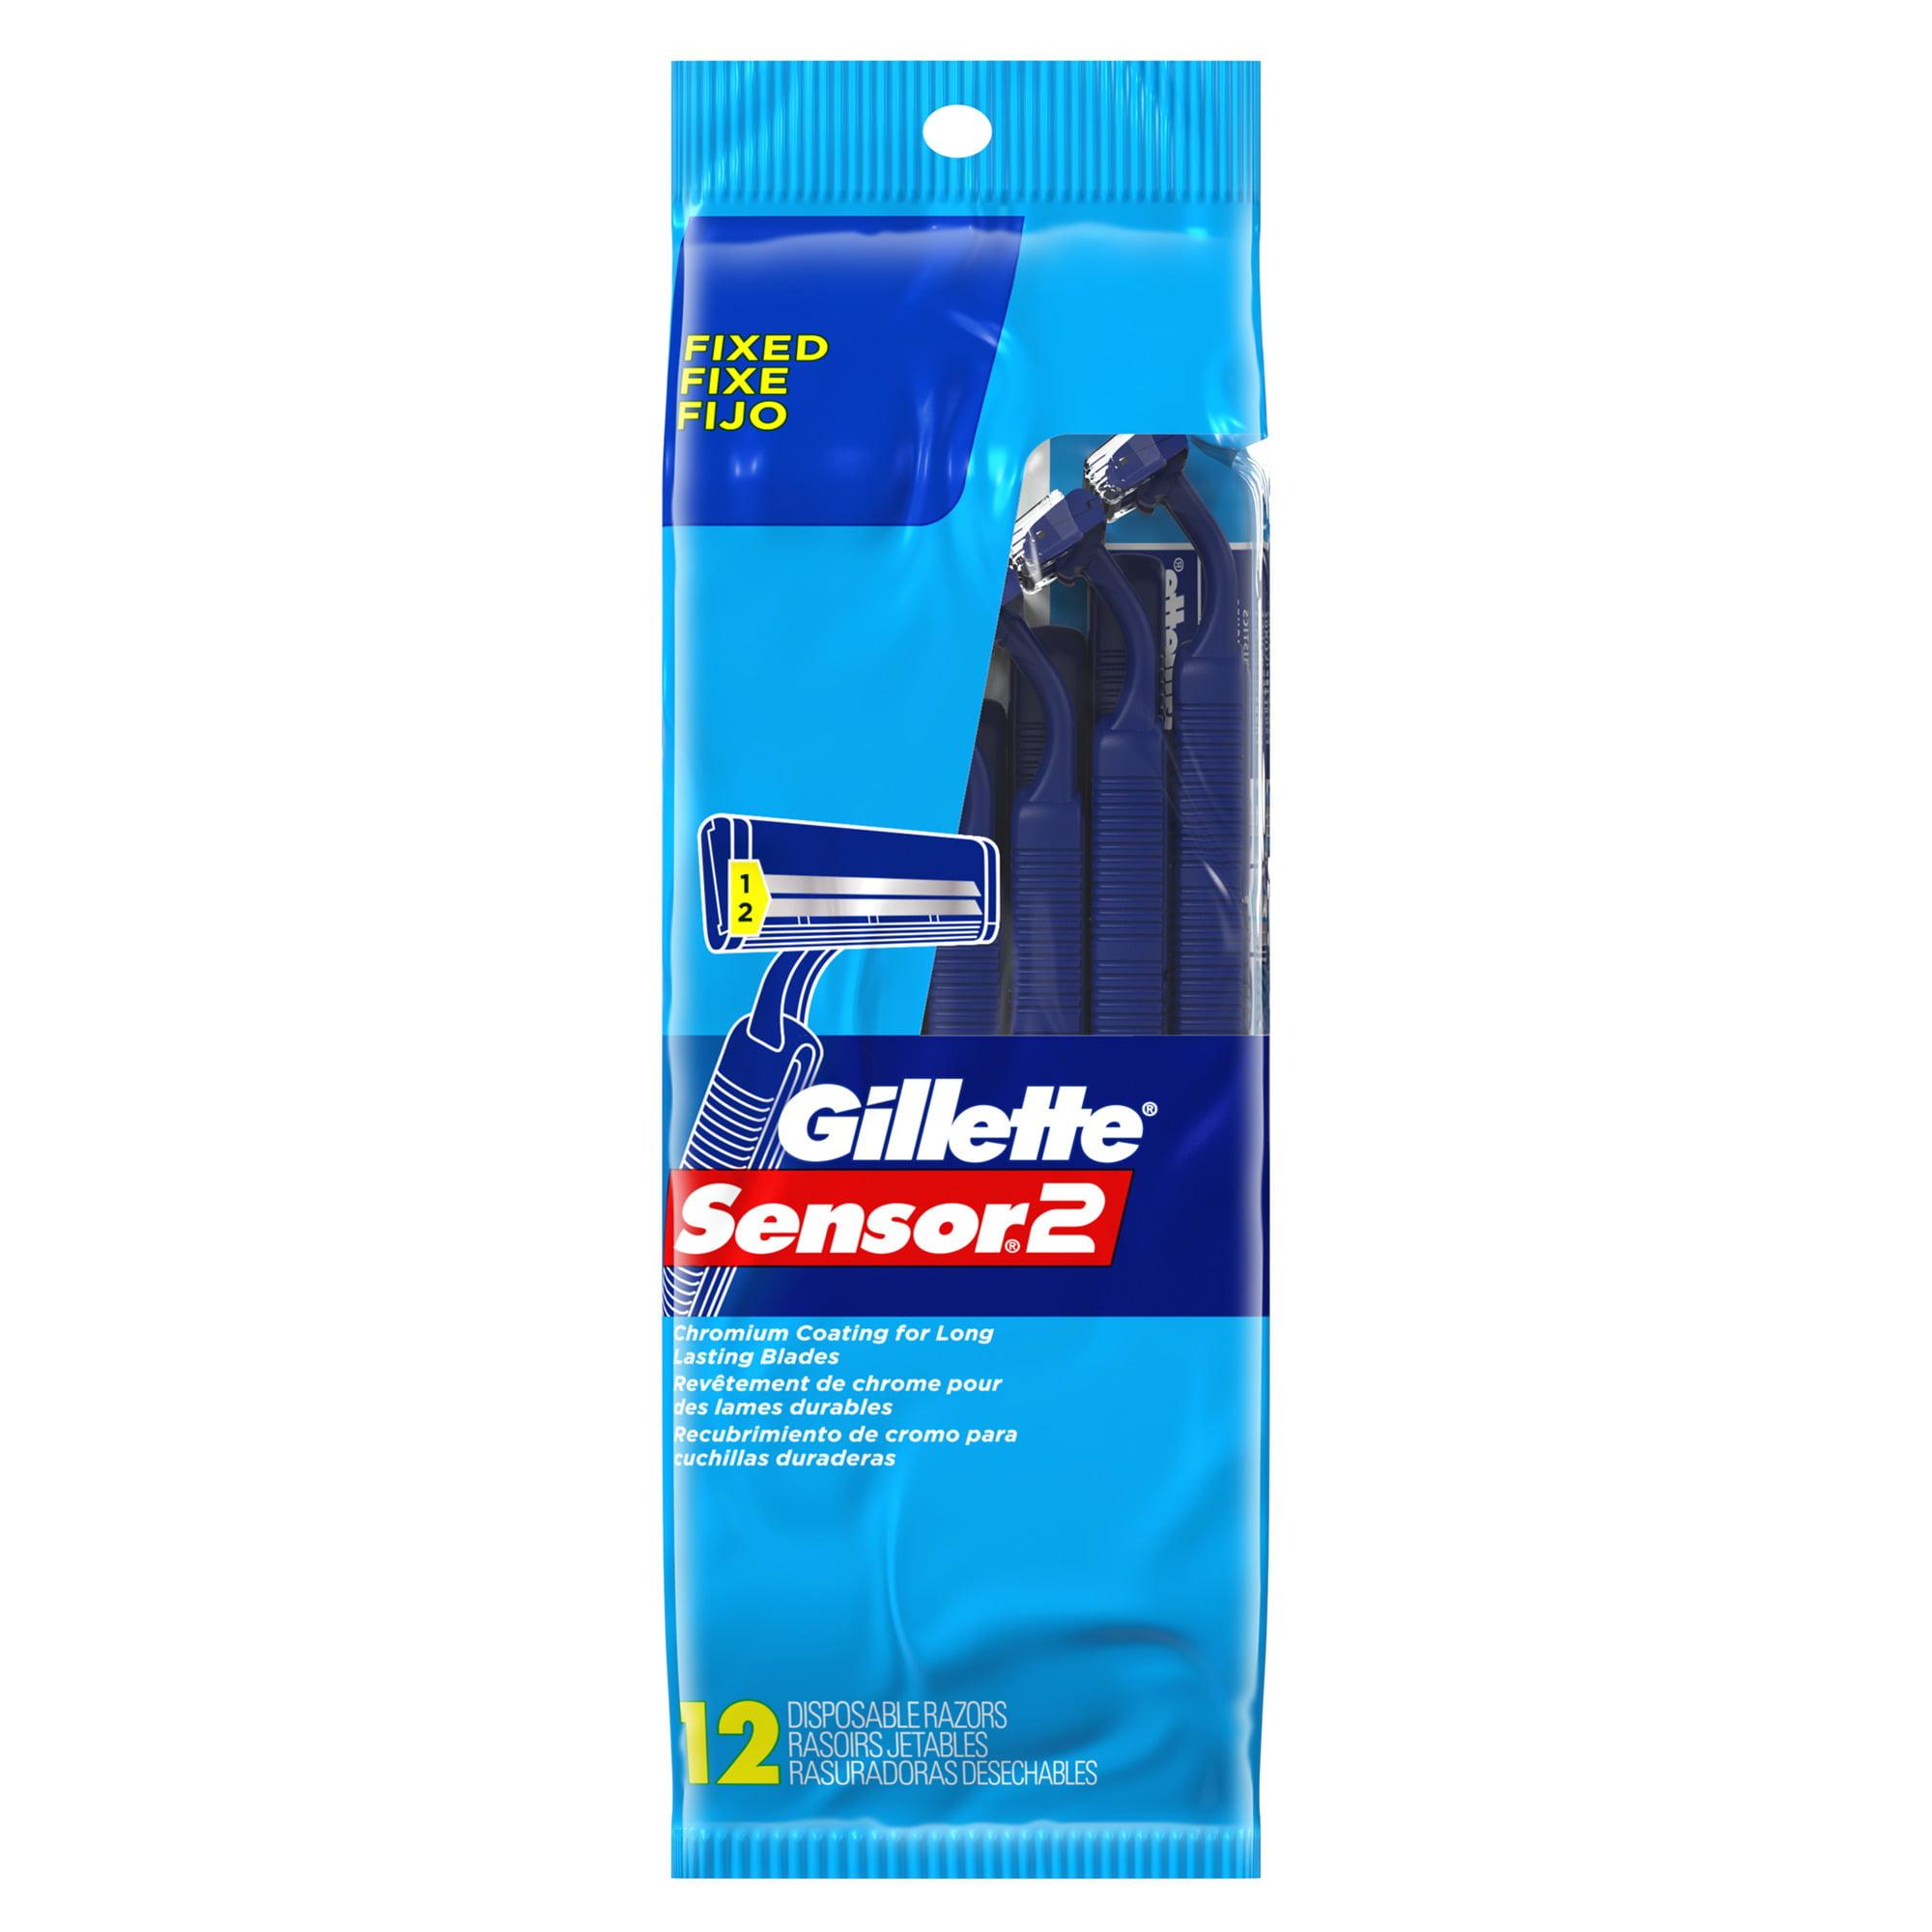 Gillette Sensor2 Disposable Razors, 12 Count